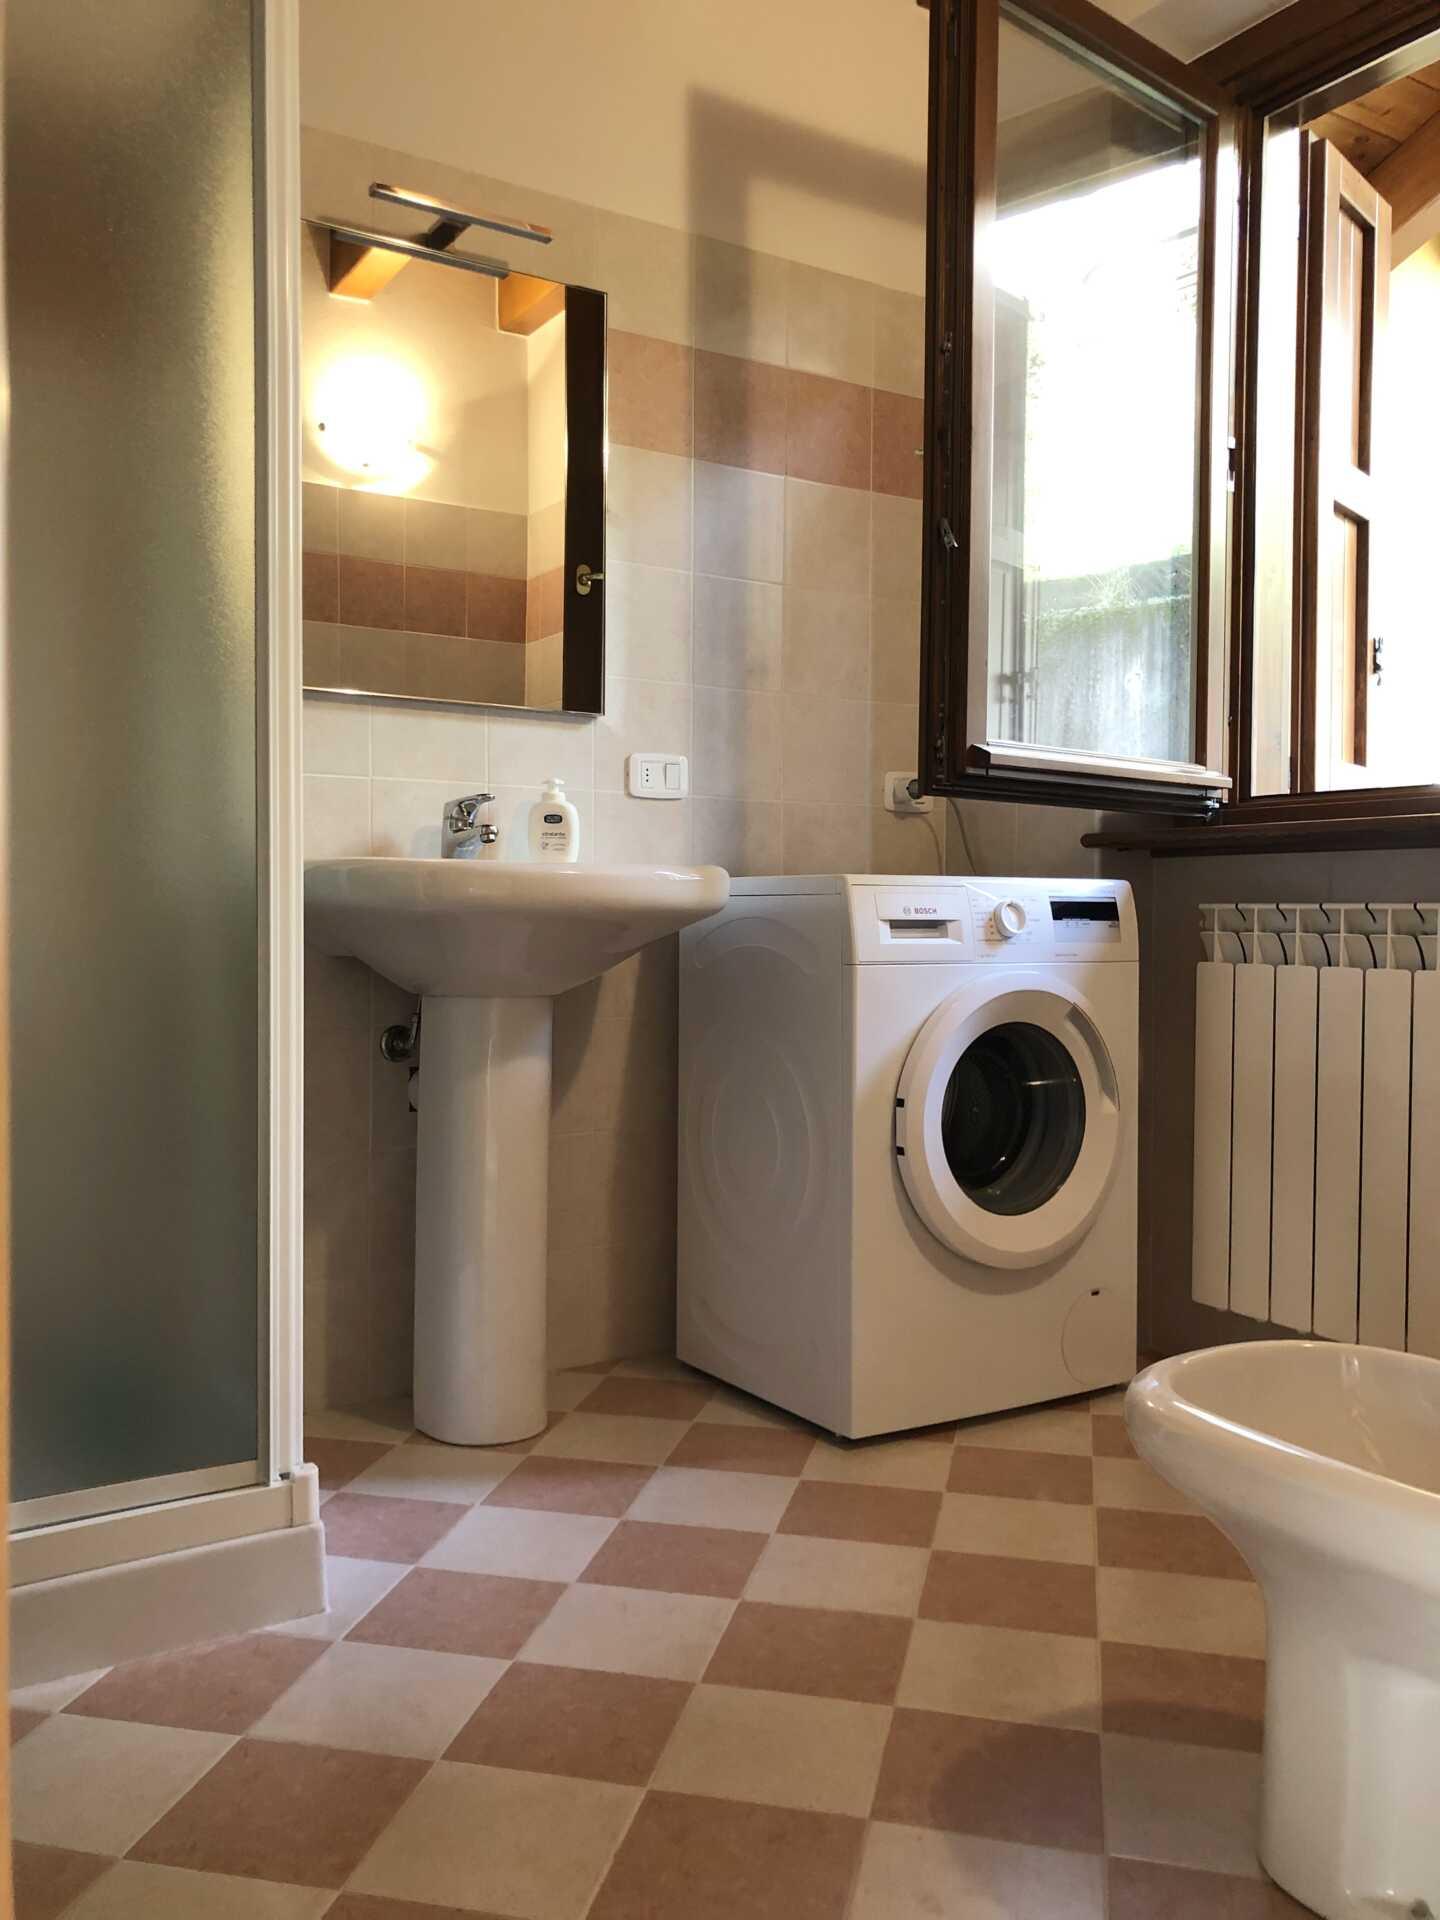 Casa-vacanze-in-vendita-appartamento-a-Dossena (16)